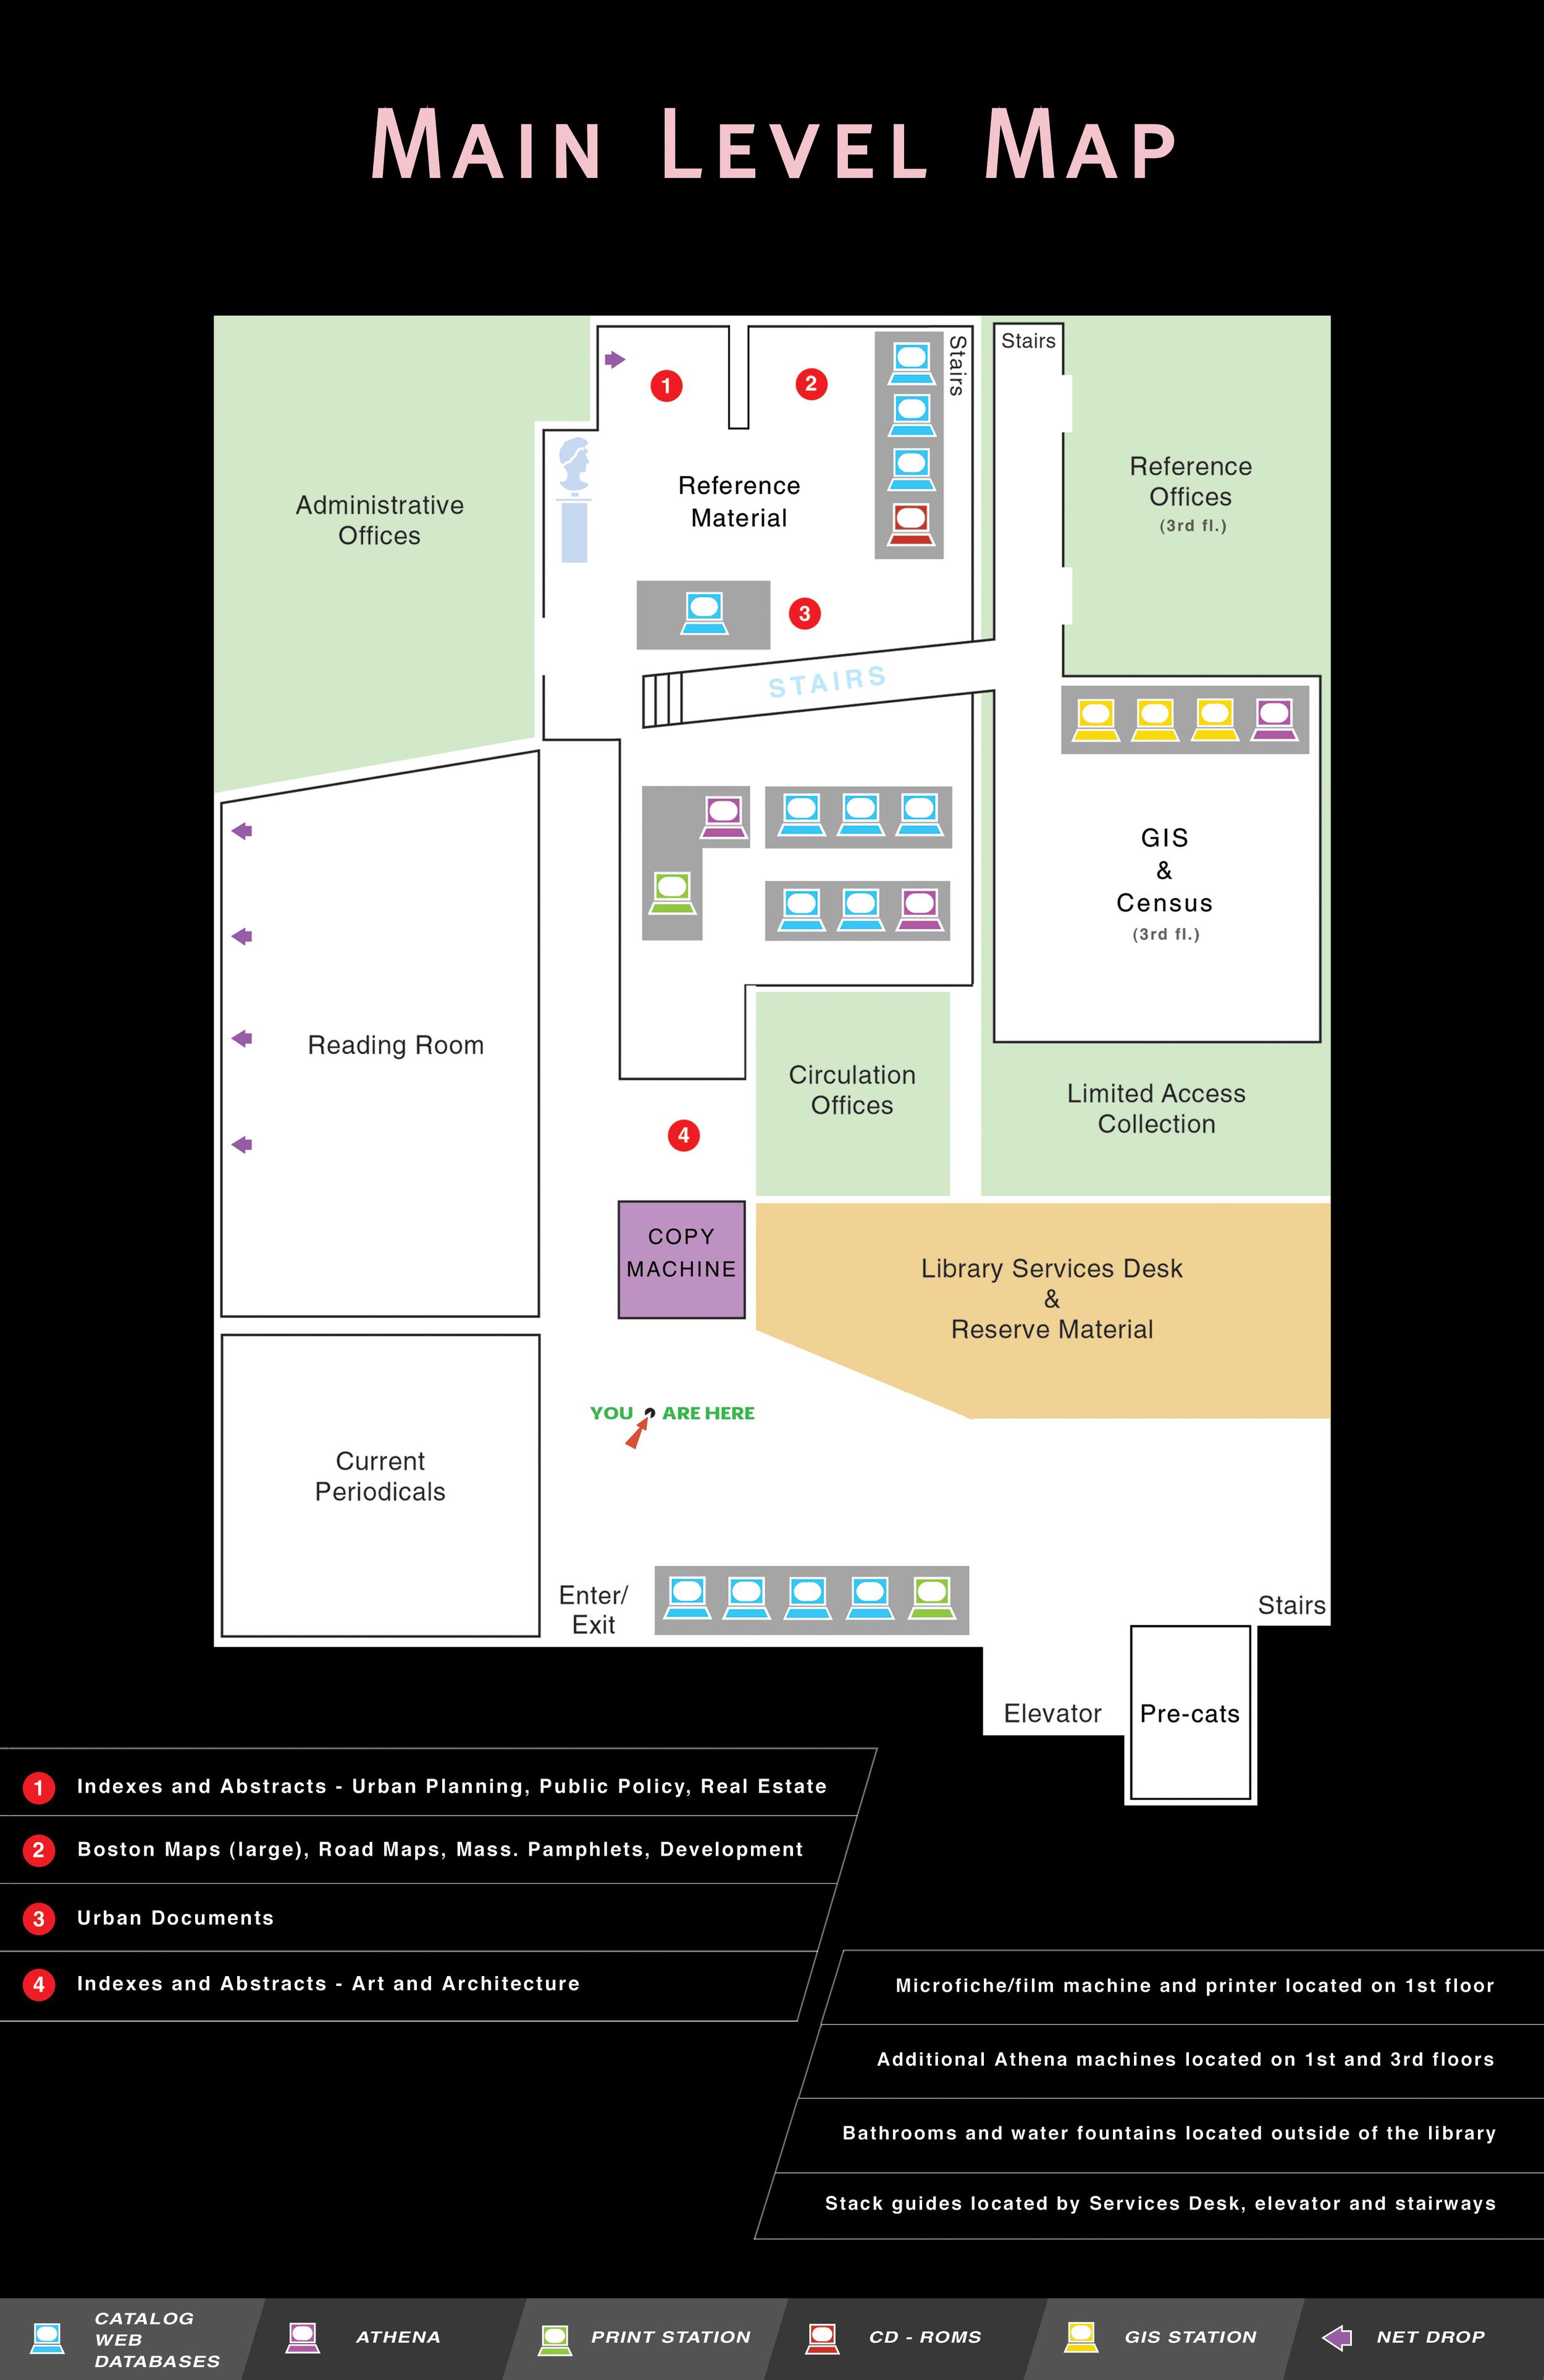 Rotch Library Main Floor Map   Tools Used :   Adobe Illustrator